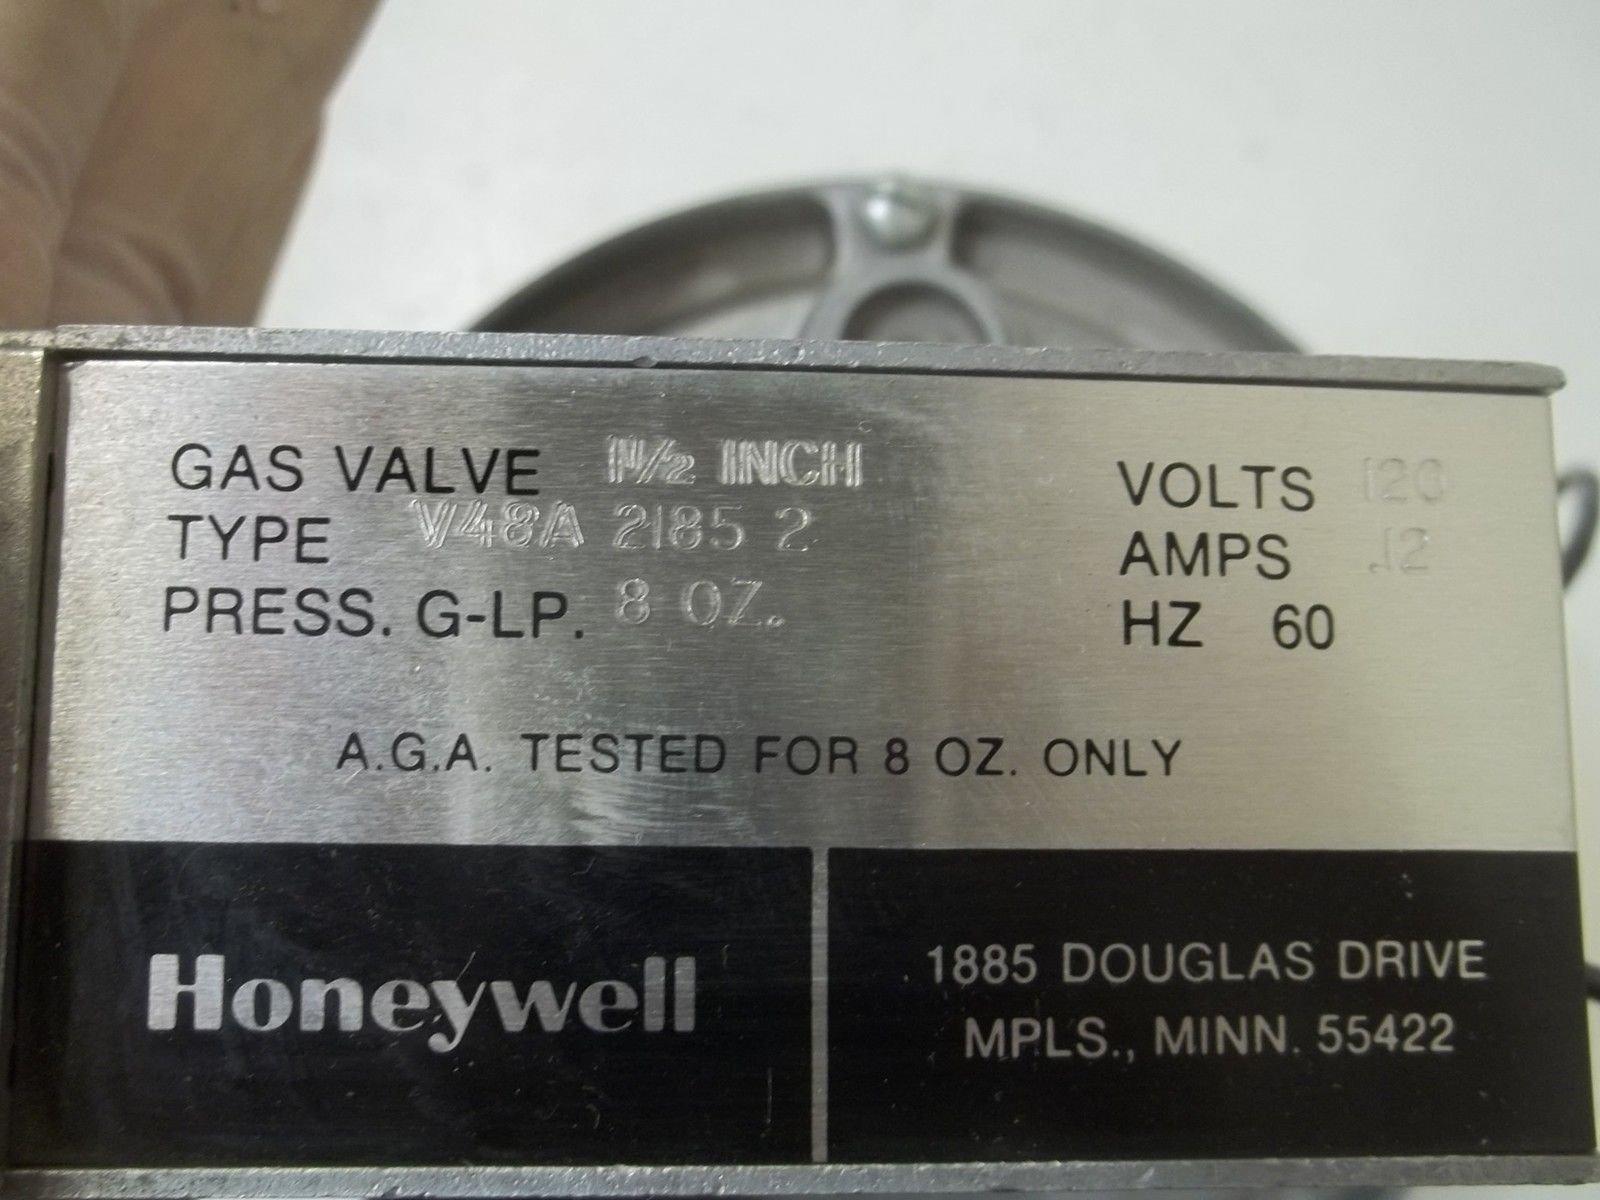 Honeywell, Inc. V48A2185 1-1/2 inch Diaphragm Gas Valve, 120 Vac